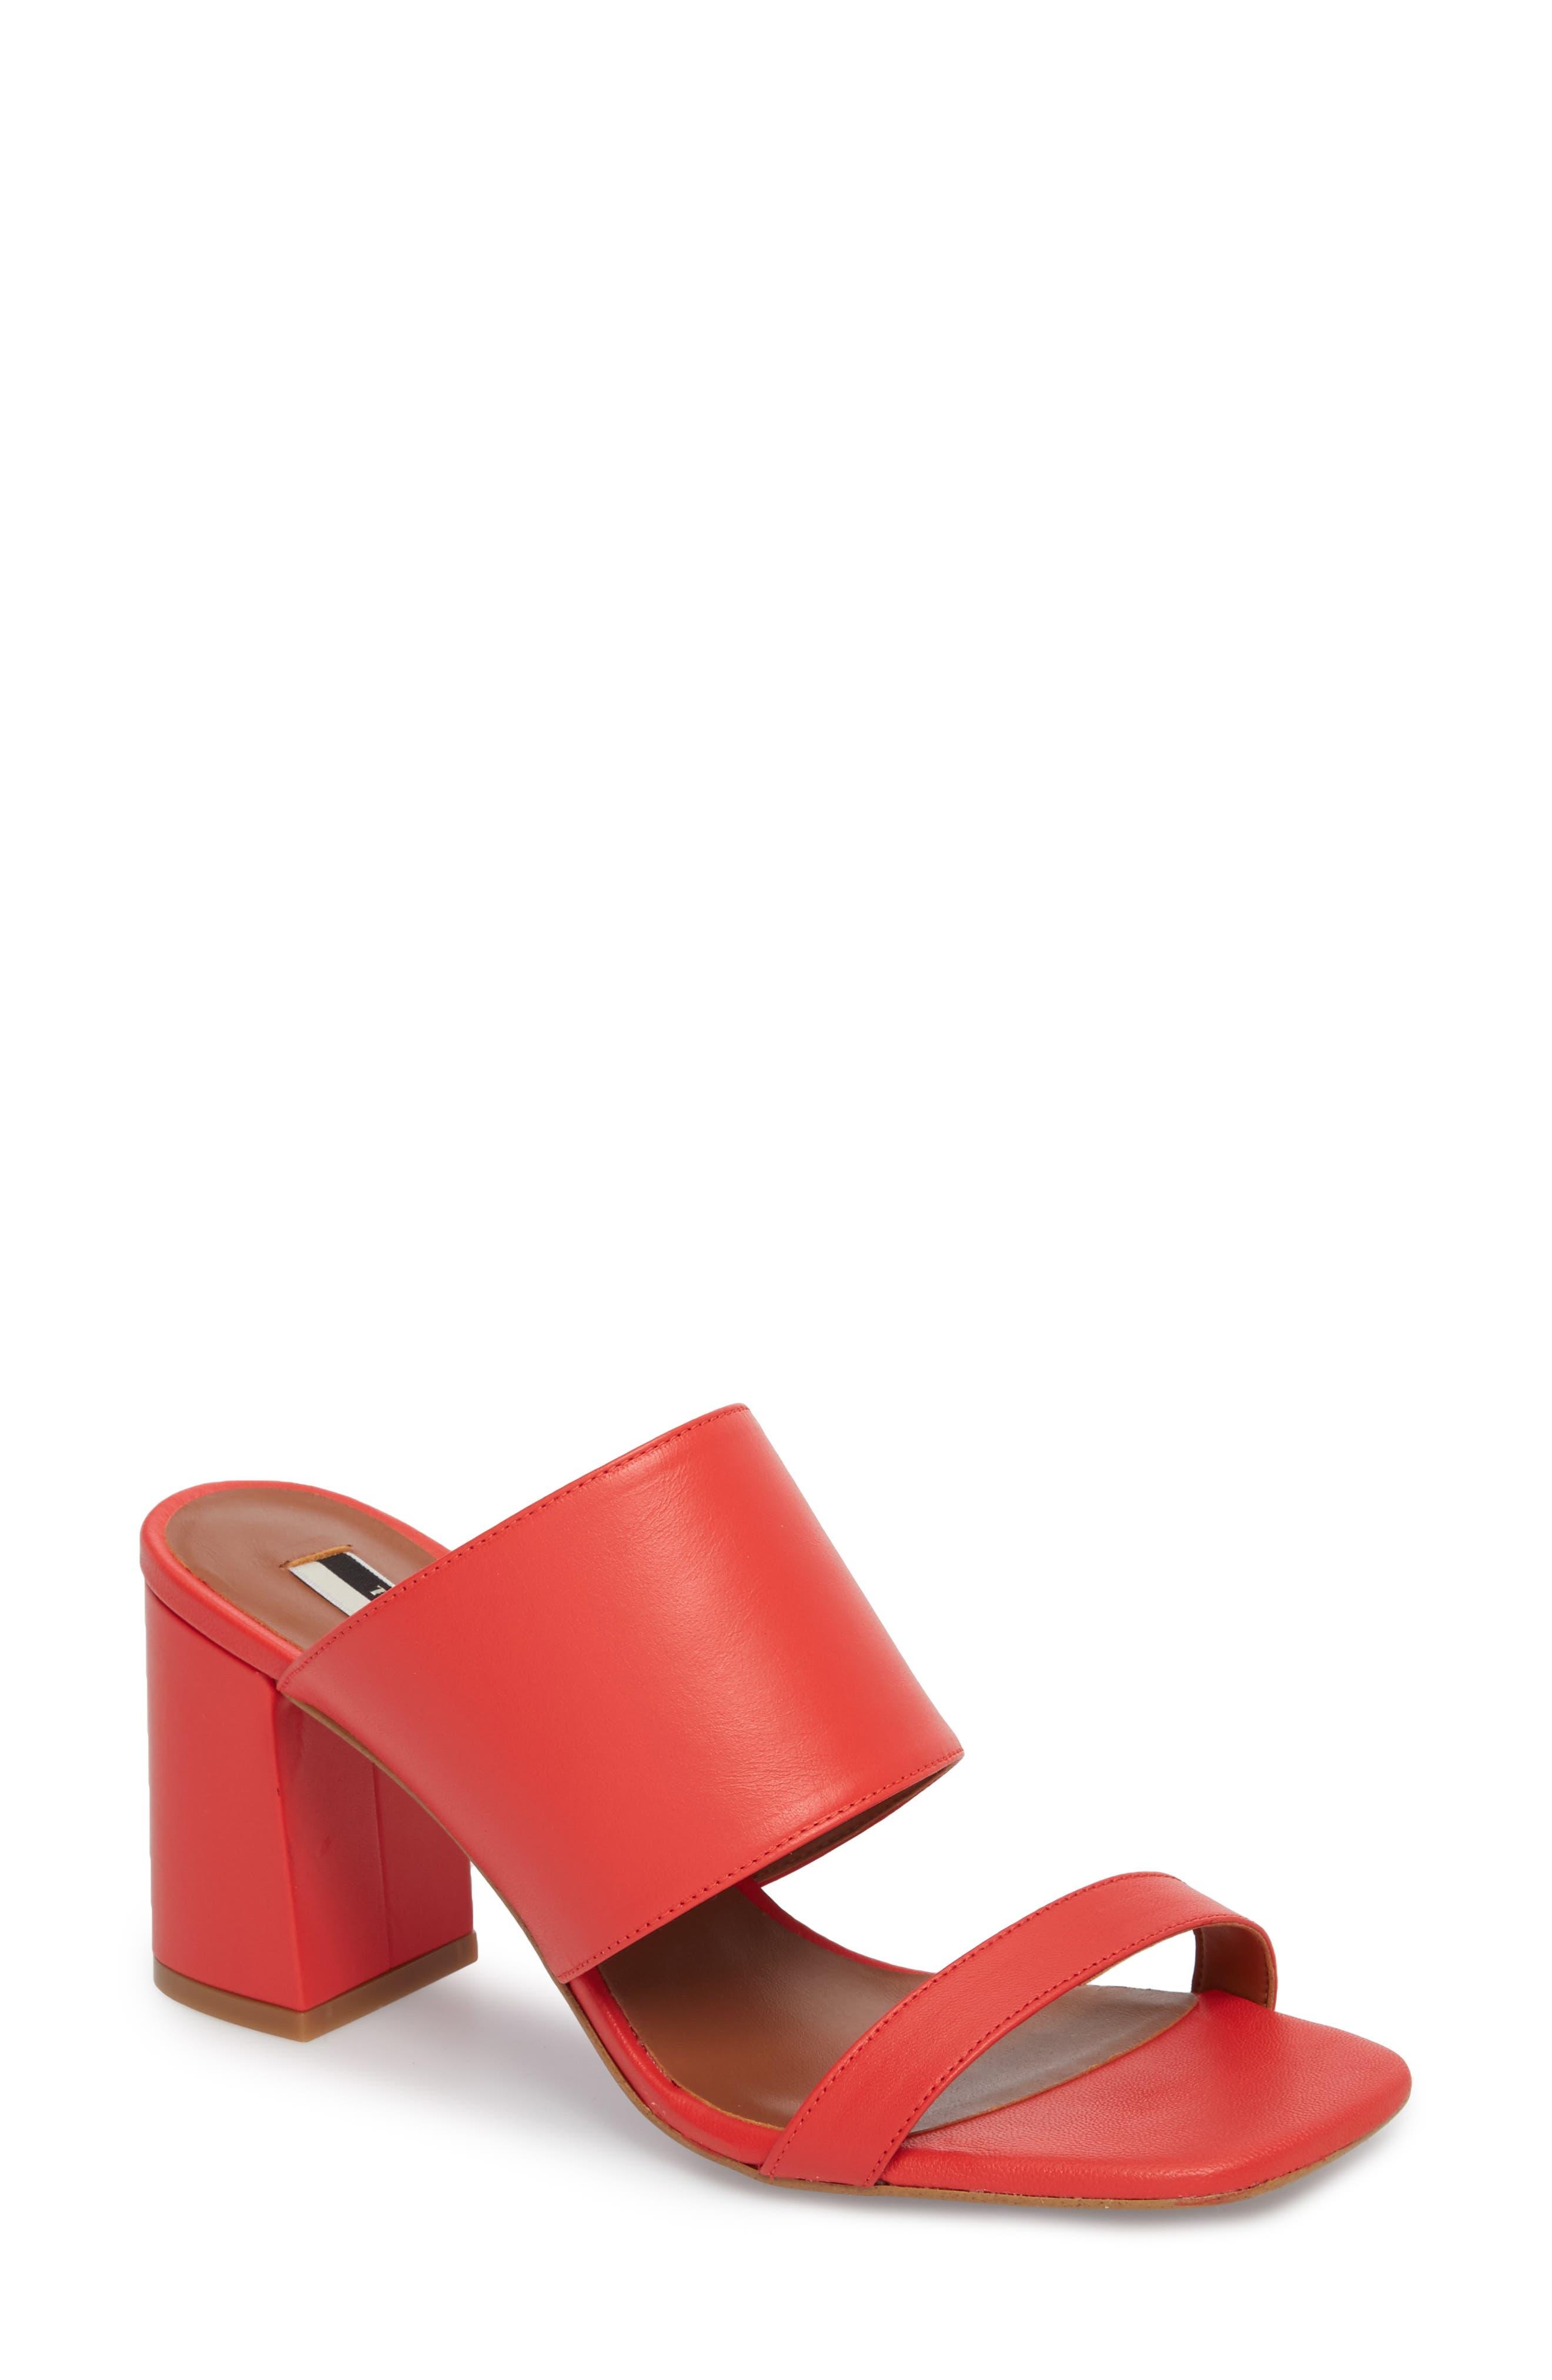 Nickle Mule Sandal,                         Main,                         color, Red